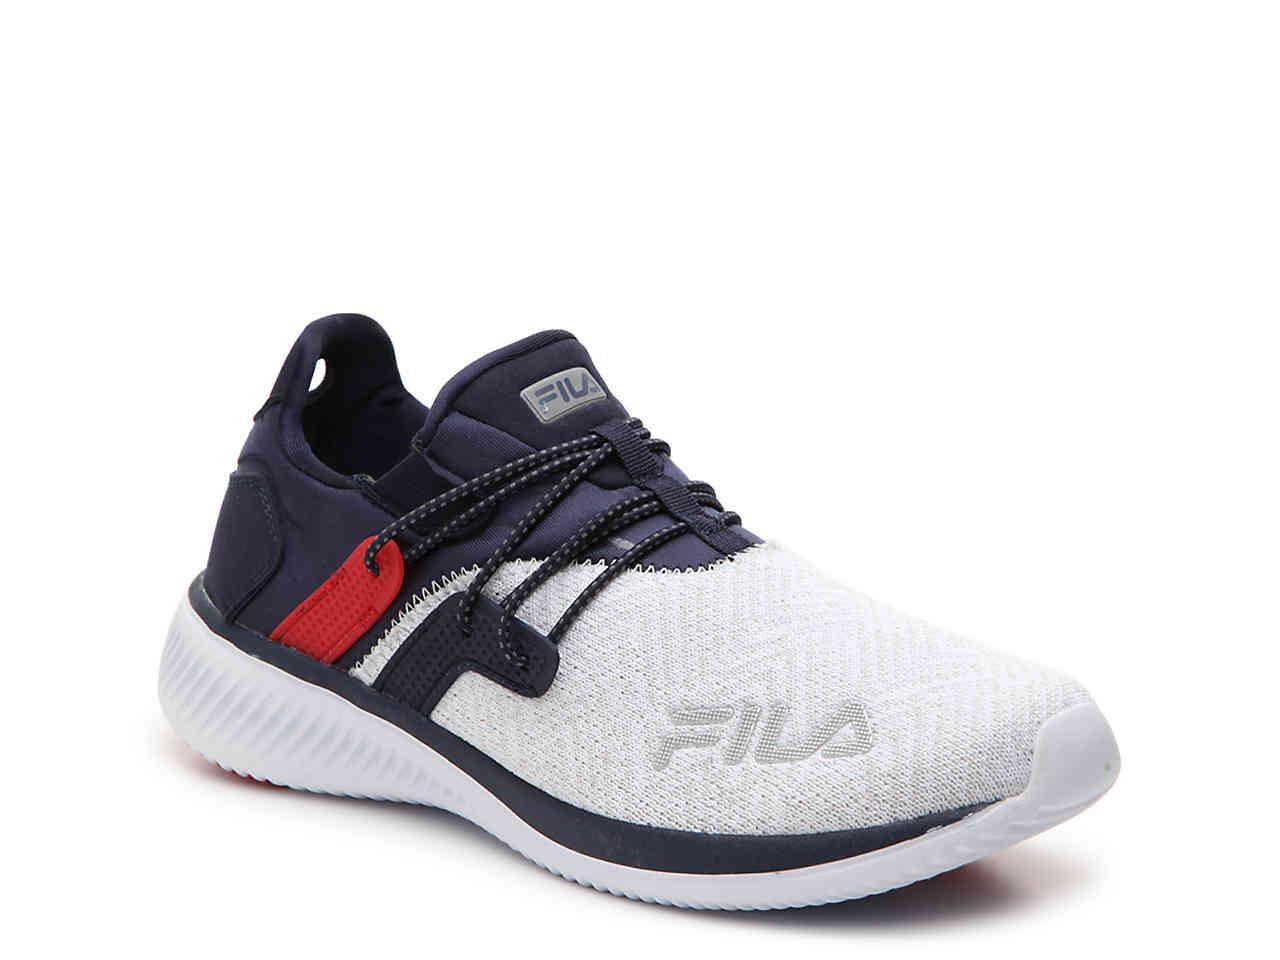 choice sale low cost Women's Fila Rapidflash 2 Slip-On Sneakers sale shop offer apBcgz